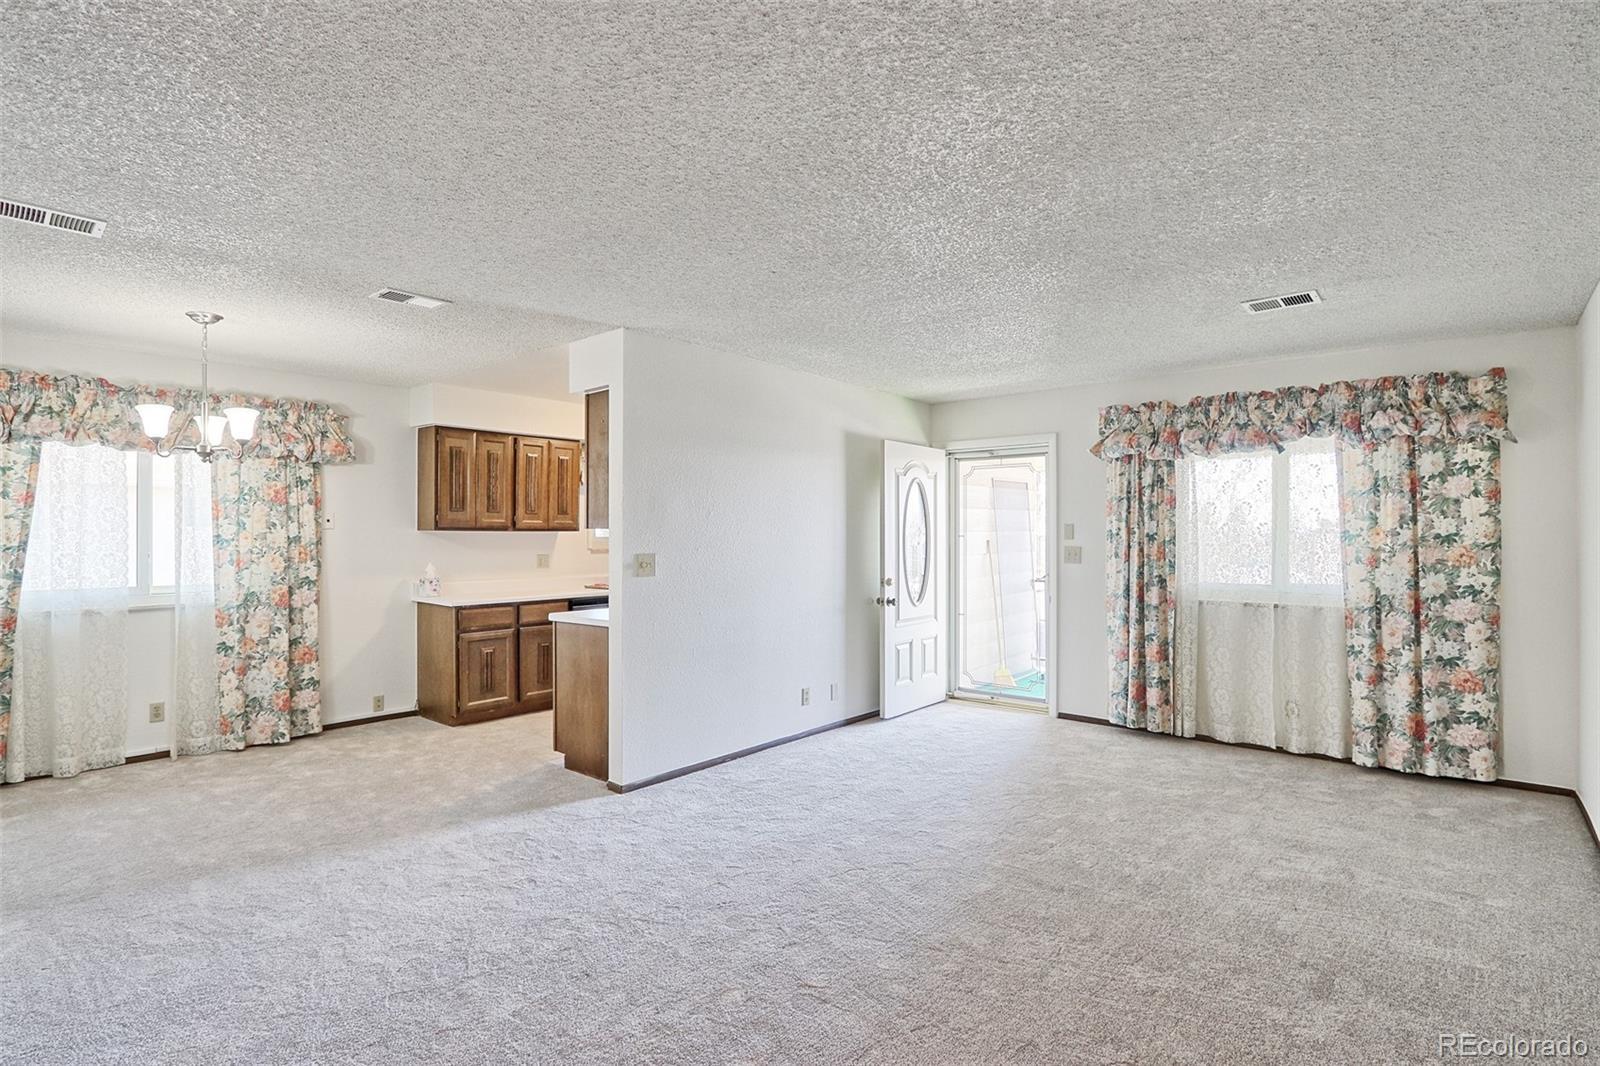 MLS# 1524000 - 3 - 9758 Orangewood Drive, Thornton, CO 80260